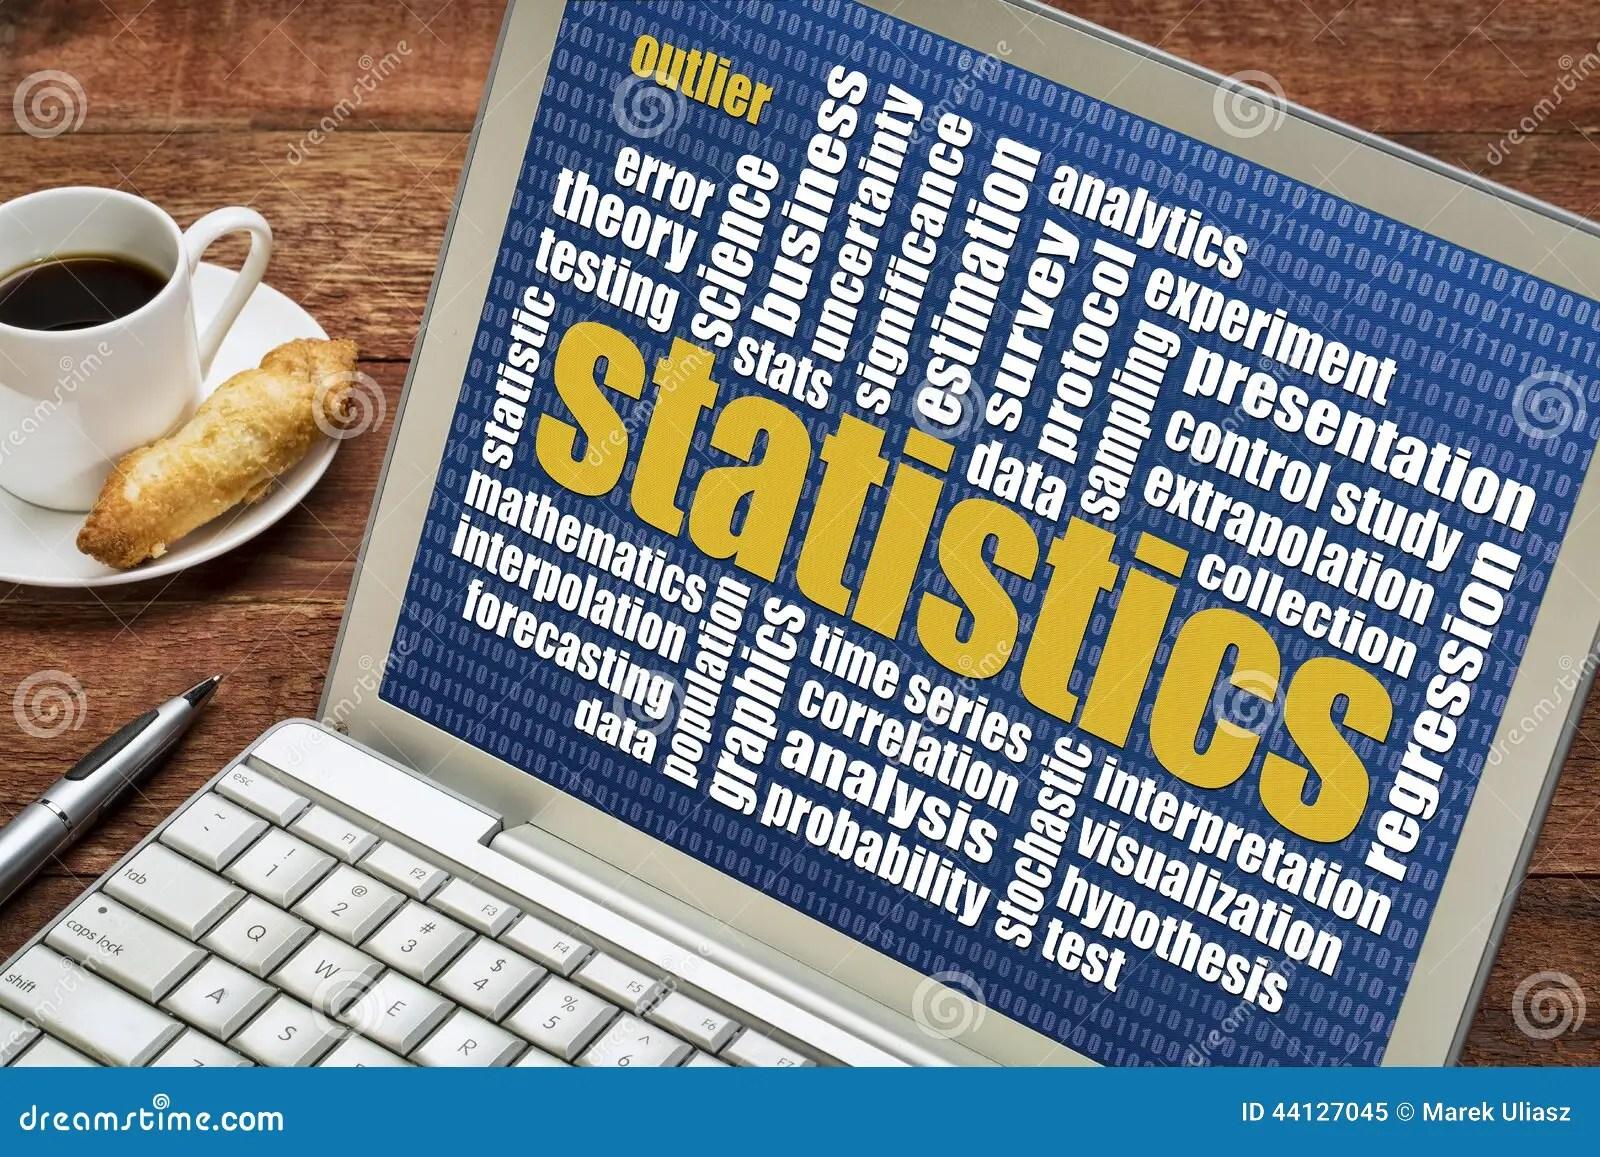 Statistics Word Cloud On Laptop Stock Photo